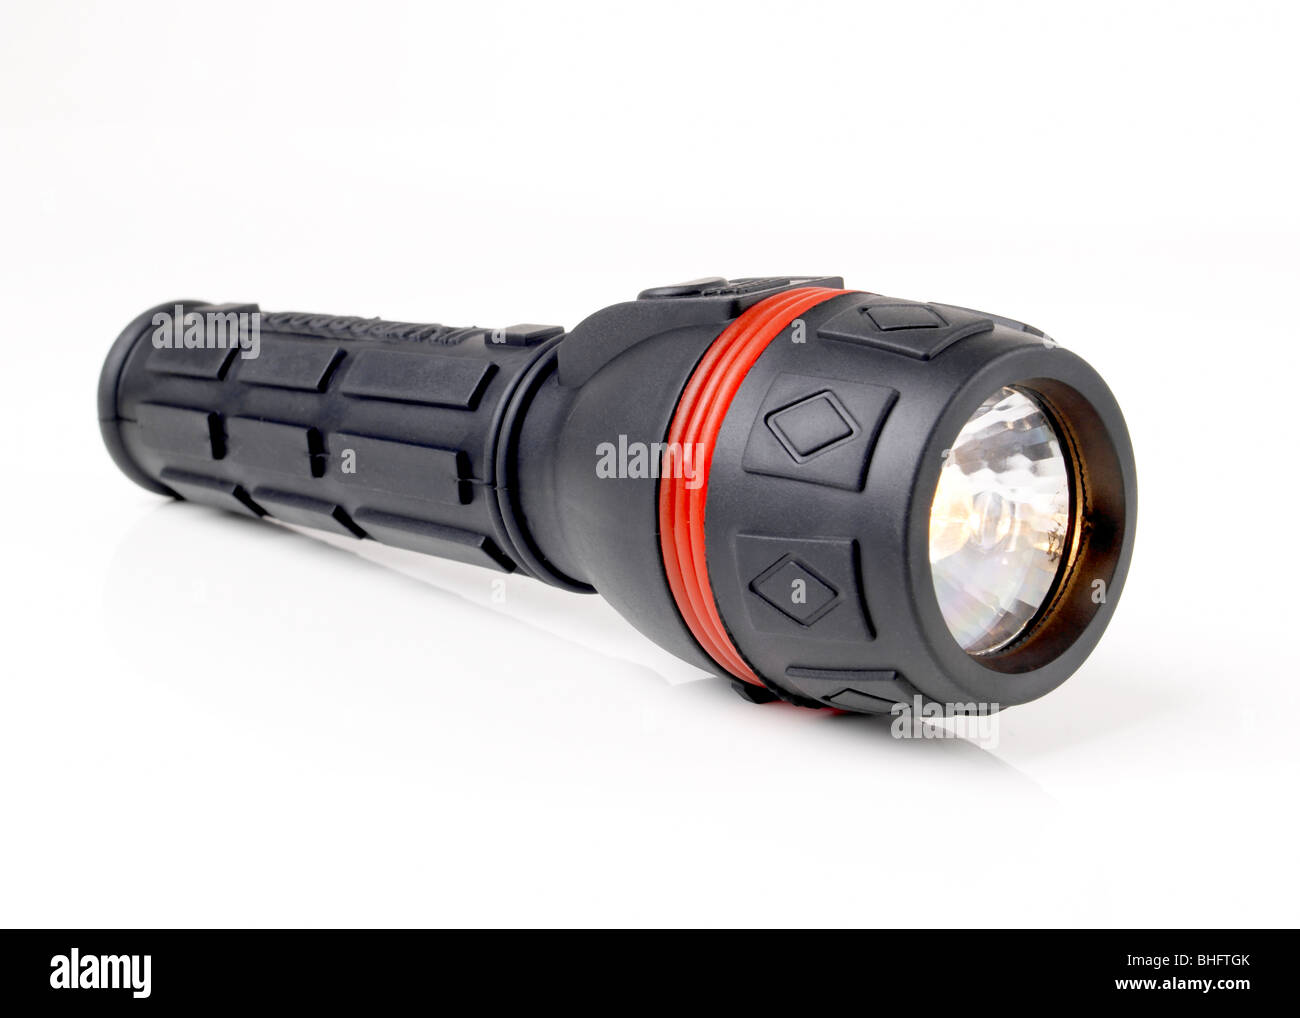 Black Flashlight - Stock Image